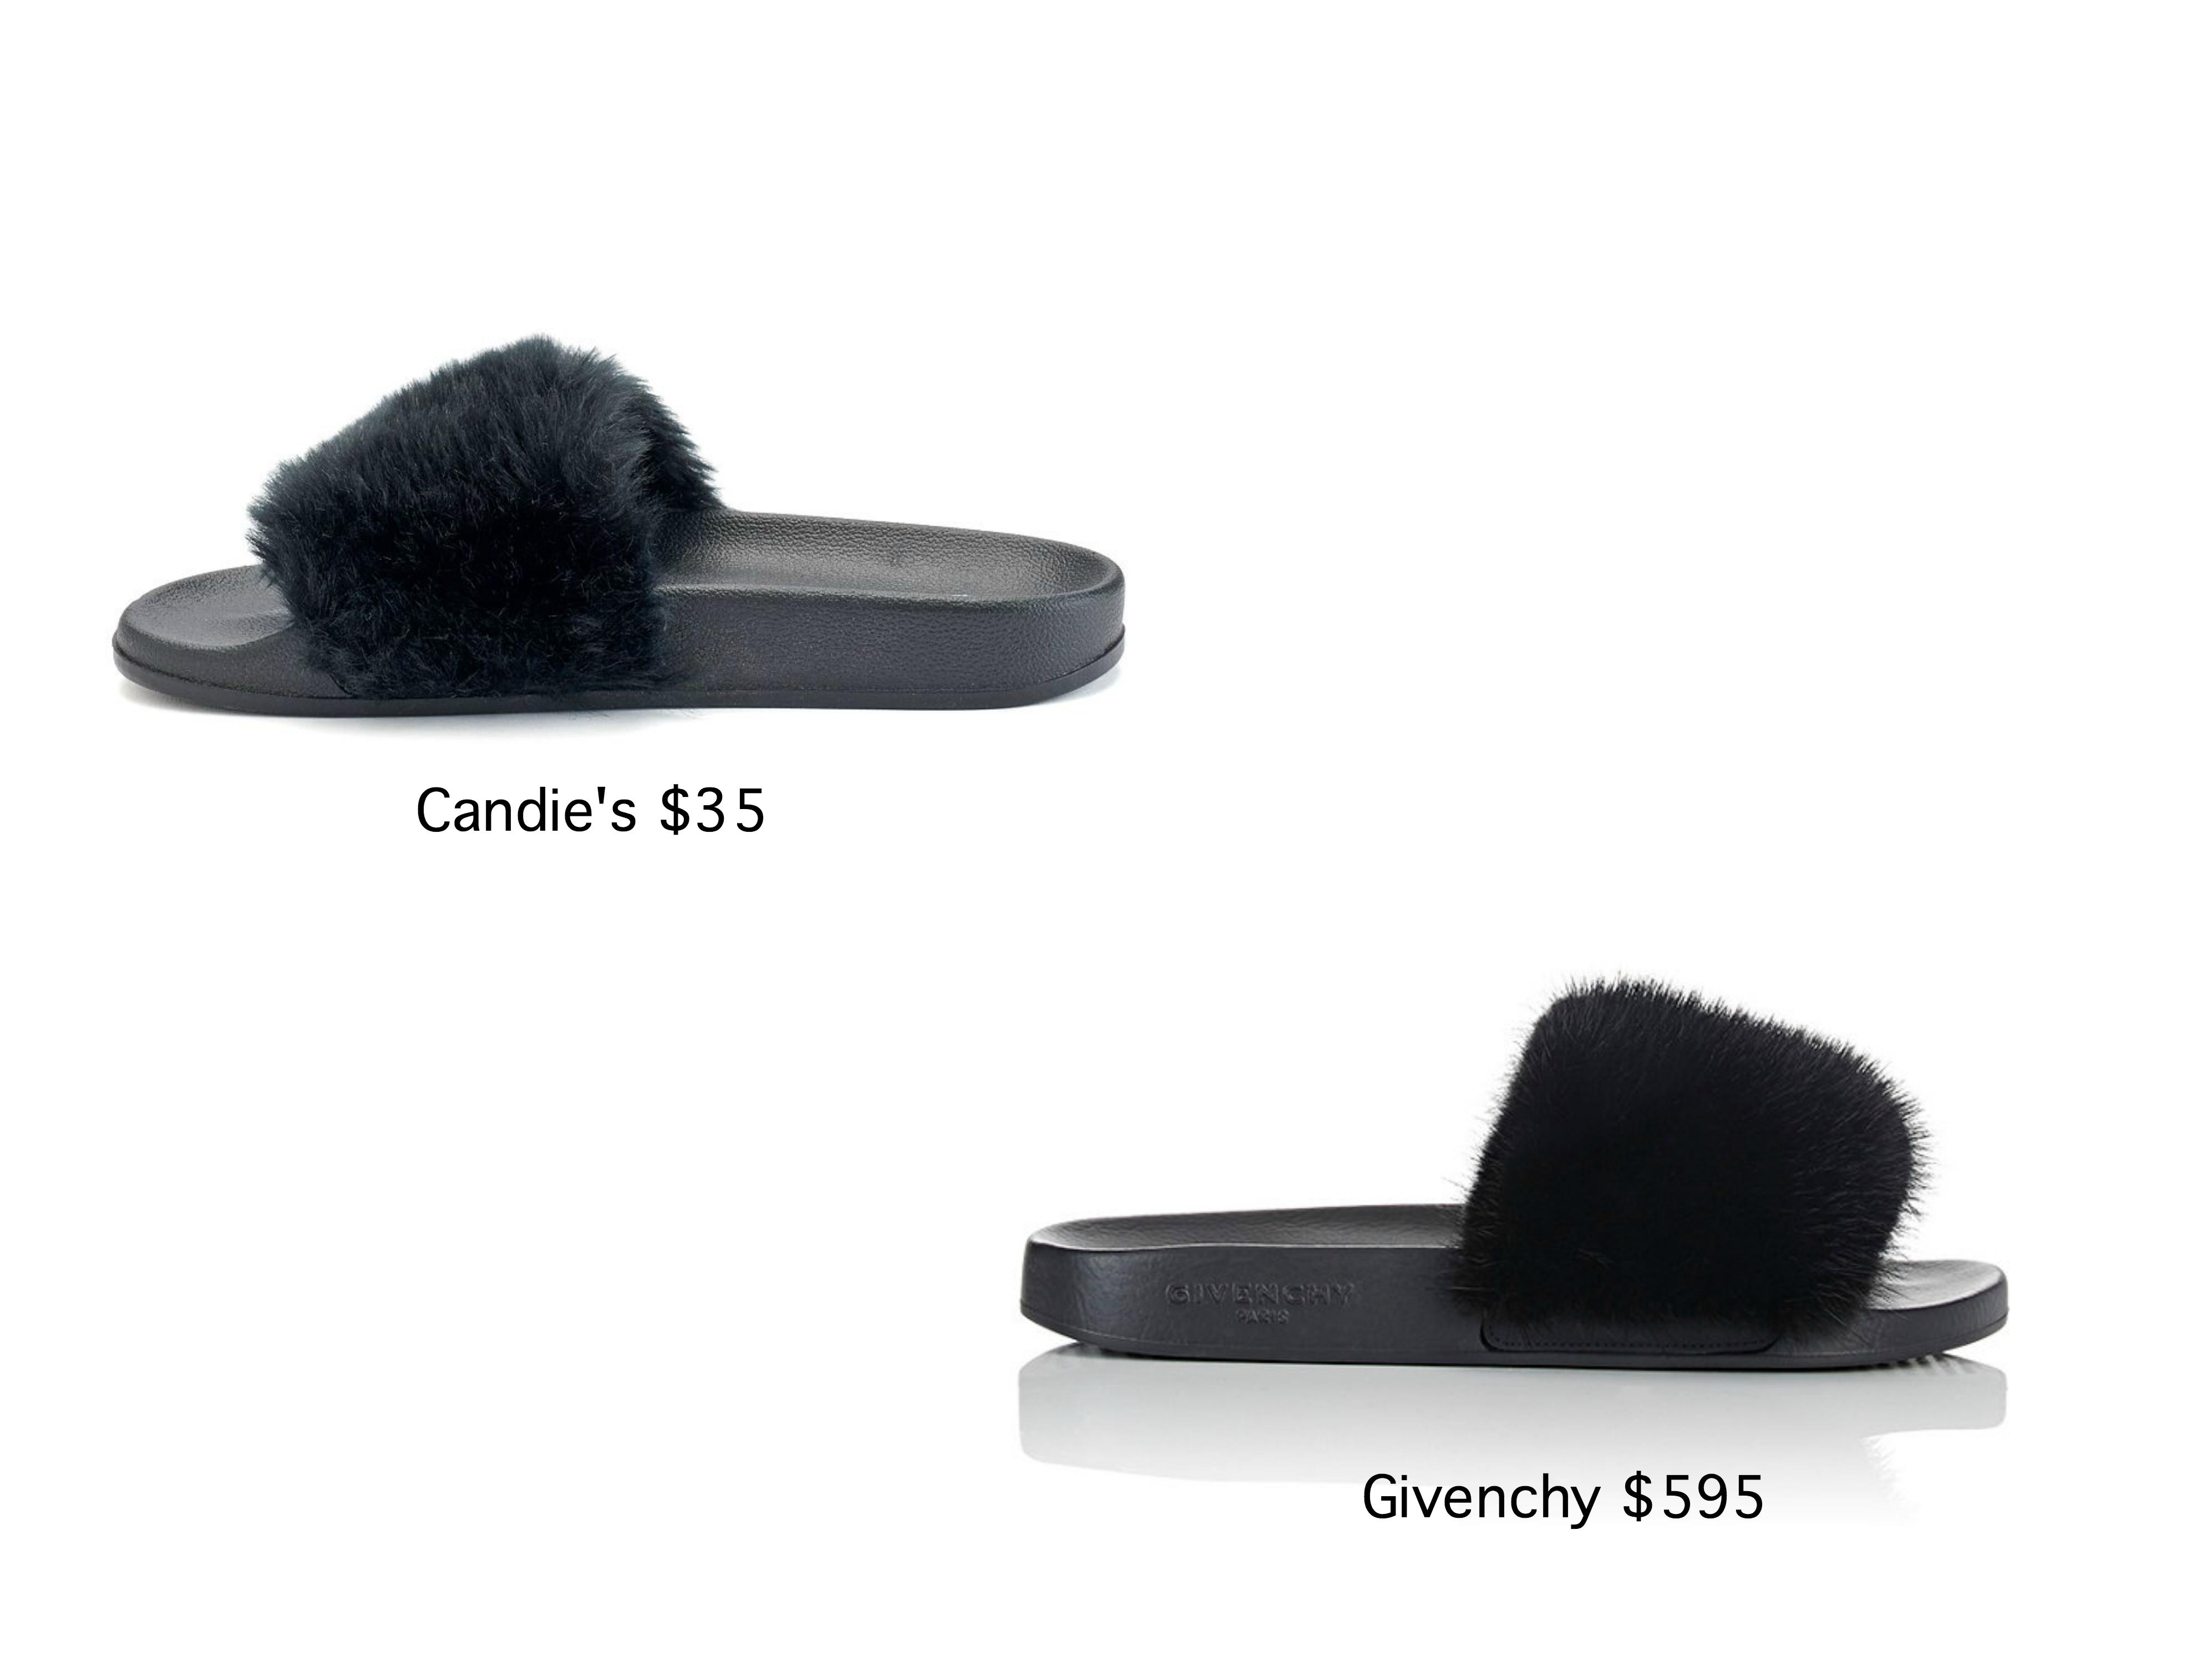 3dd2f3a070e3 Givenchy vs Candie s Fur Sandals  Fur Fun s Sake - Snob Essentials